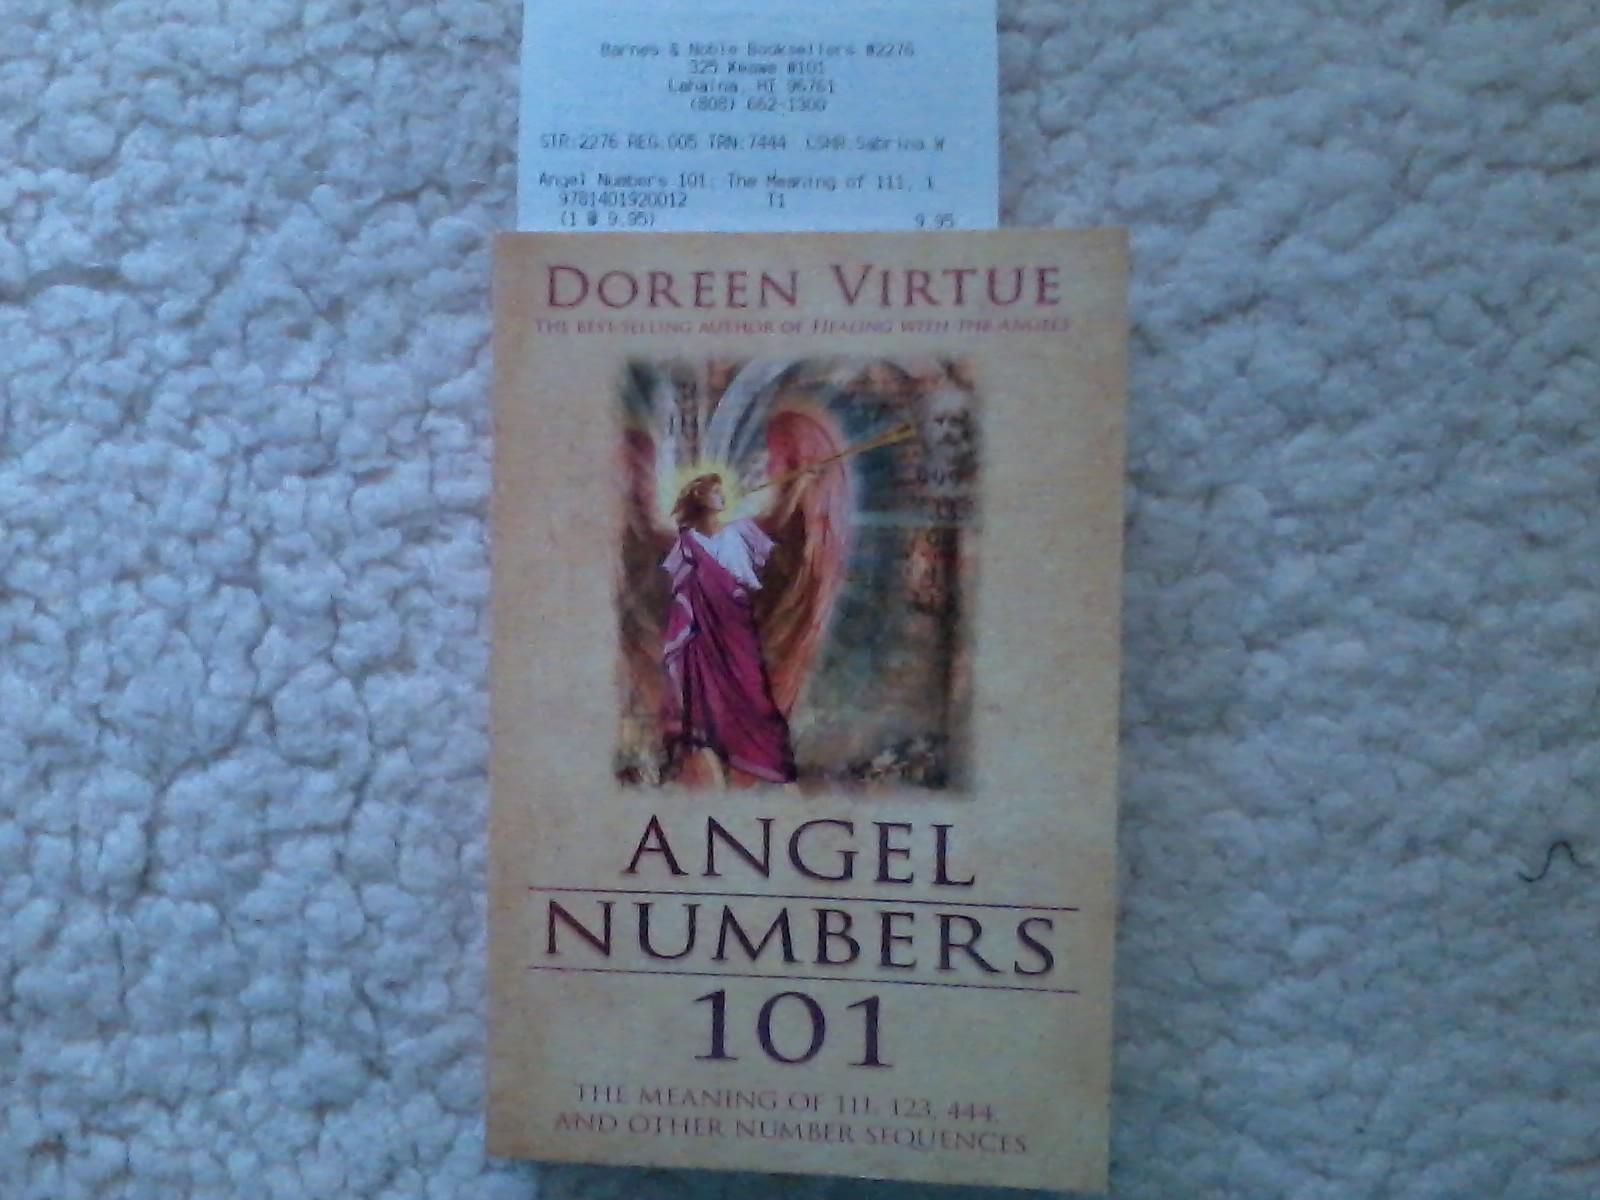 Life, actually: Sixth sense through angel Number